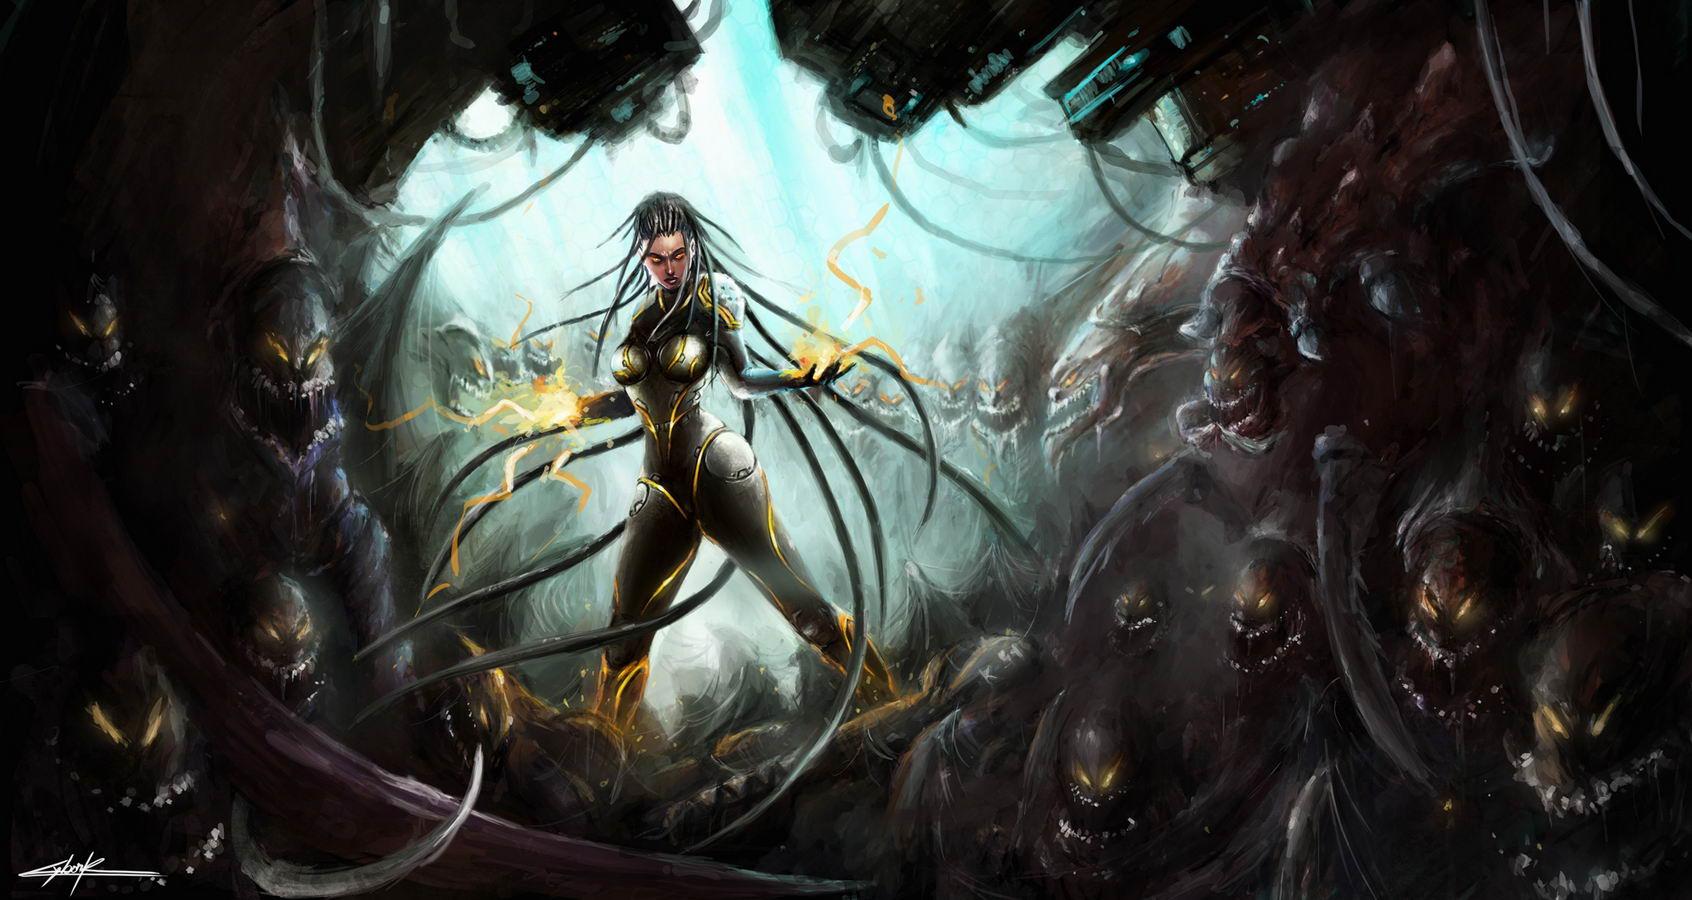 Арт StarCraft II: Heart of the Swarm